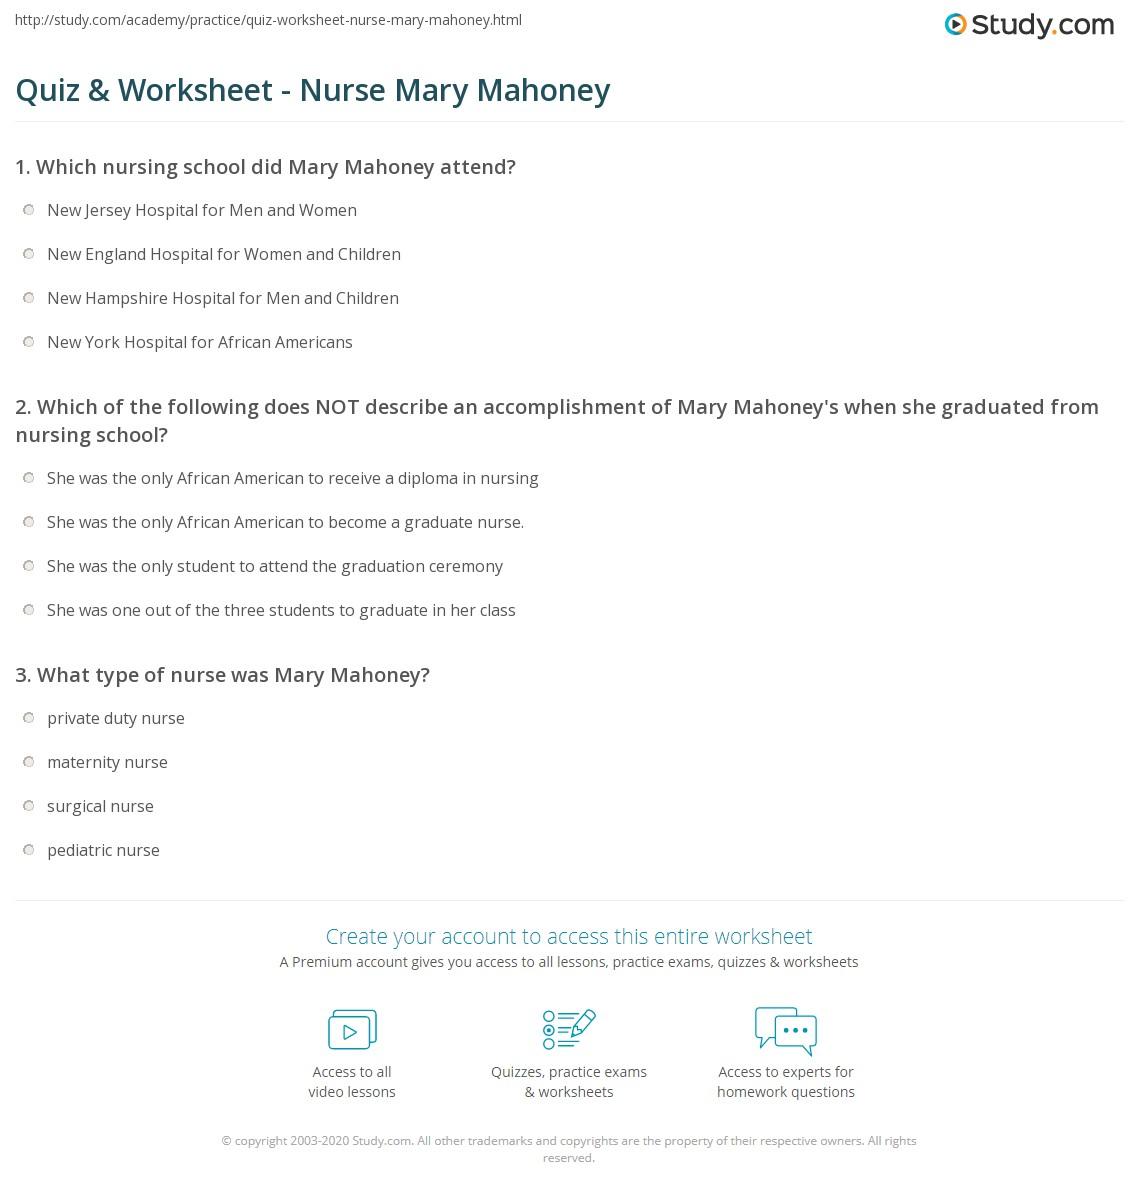 Quiz & Worksheet - Nurse Mary Mahoney   Study.com